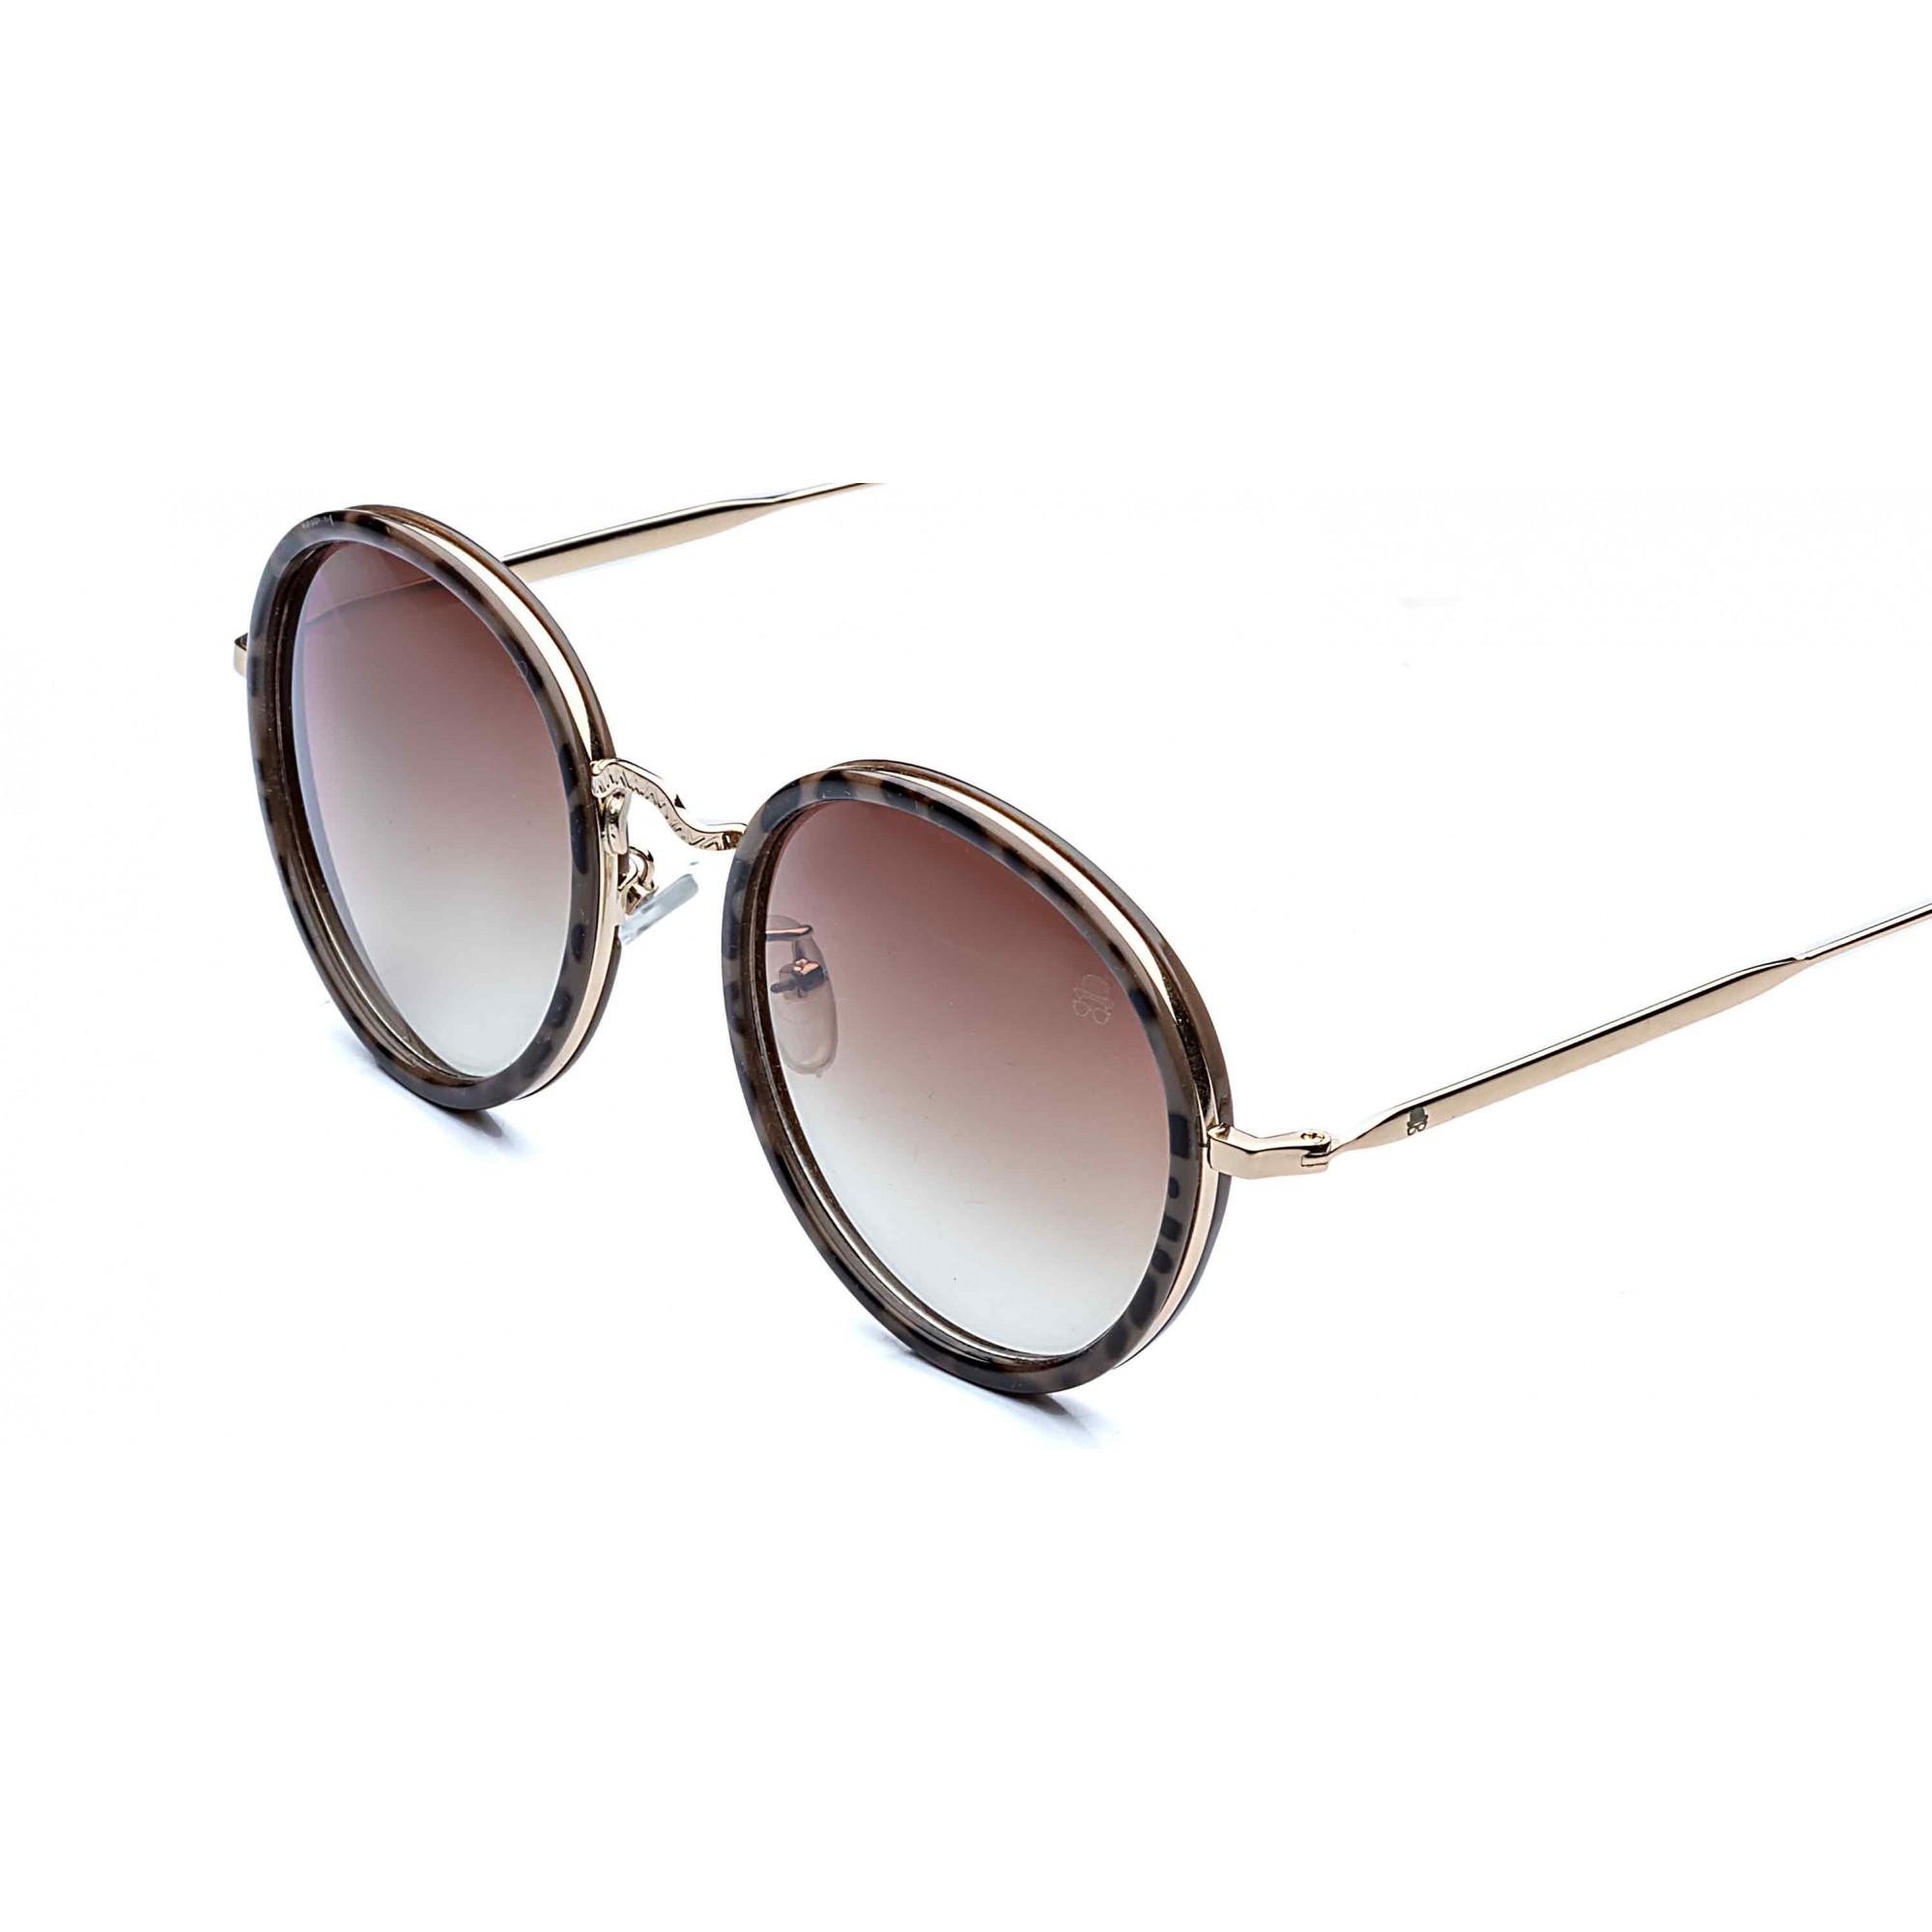 Queen Rafael Lopes Eyewear